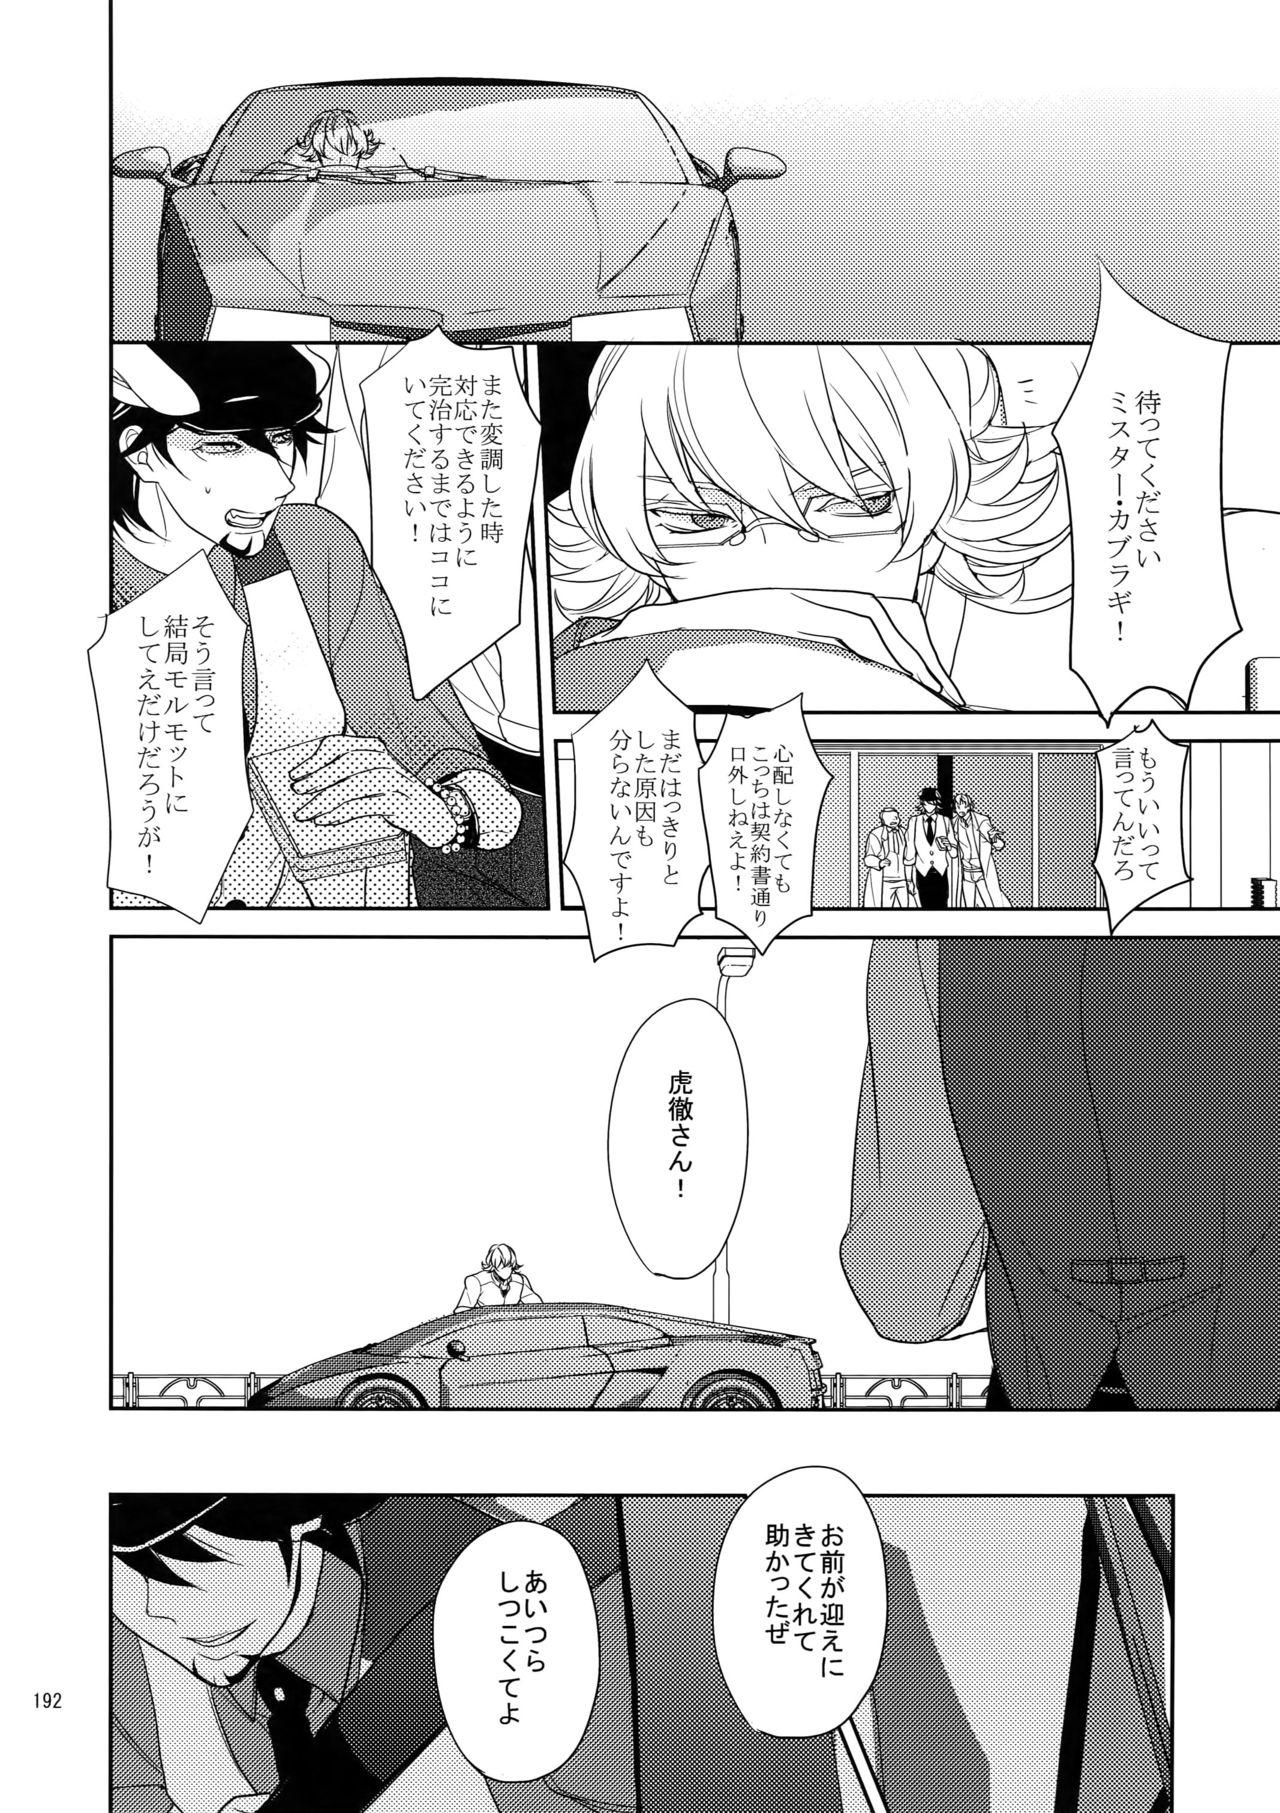 BOROZS Usagi Tora Sairoku 190